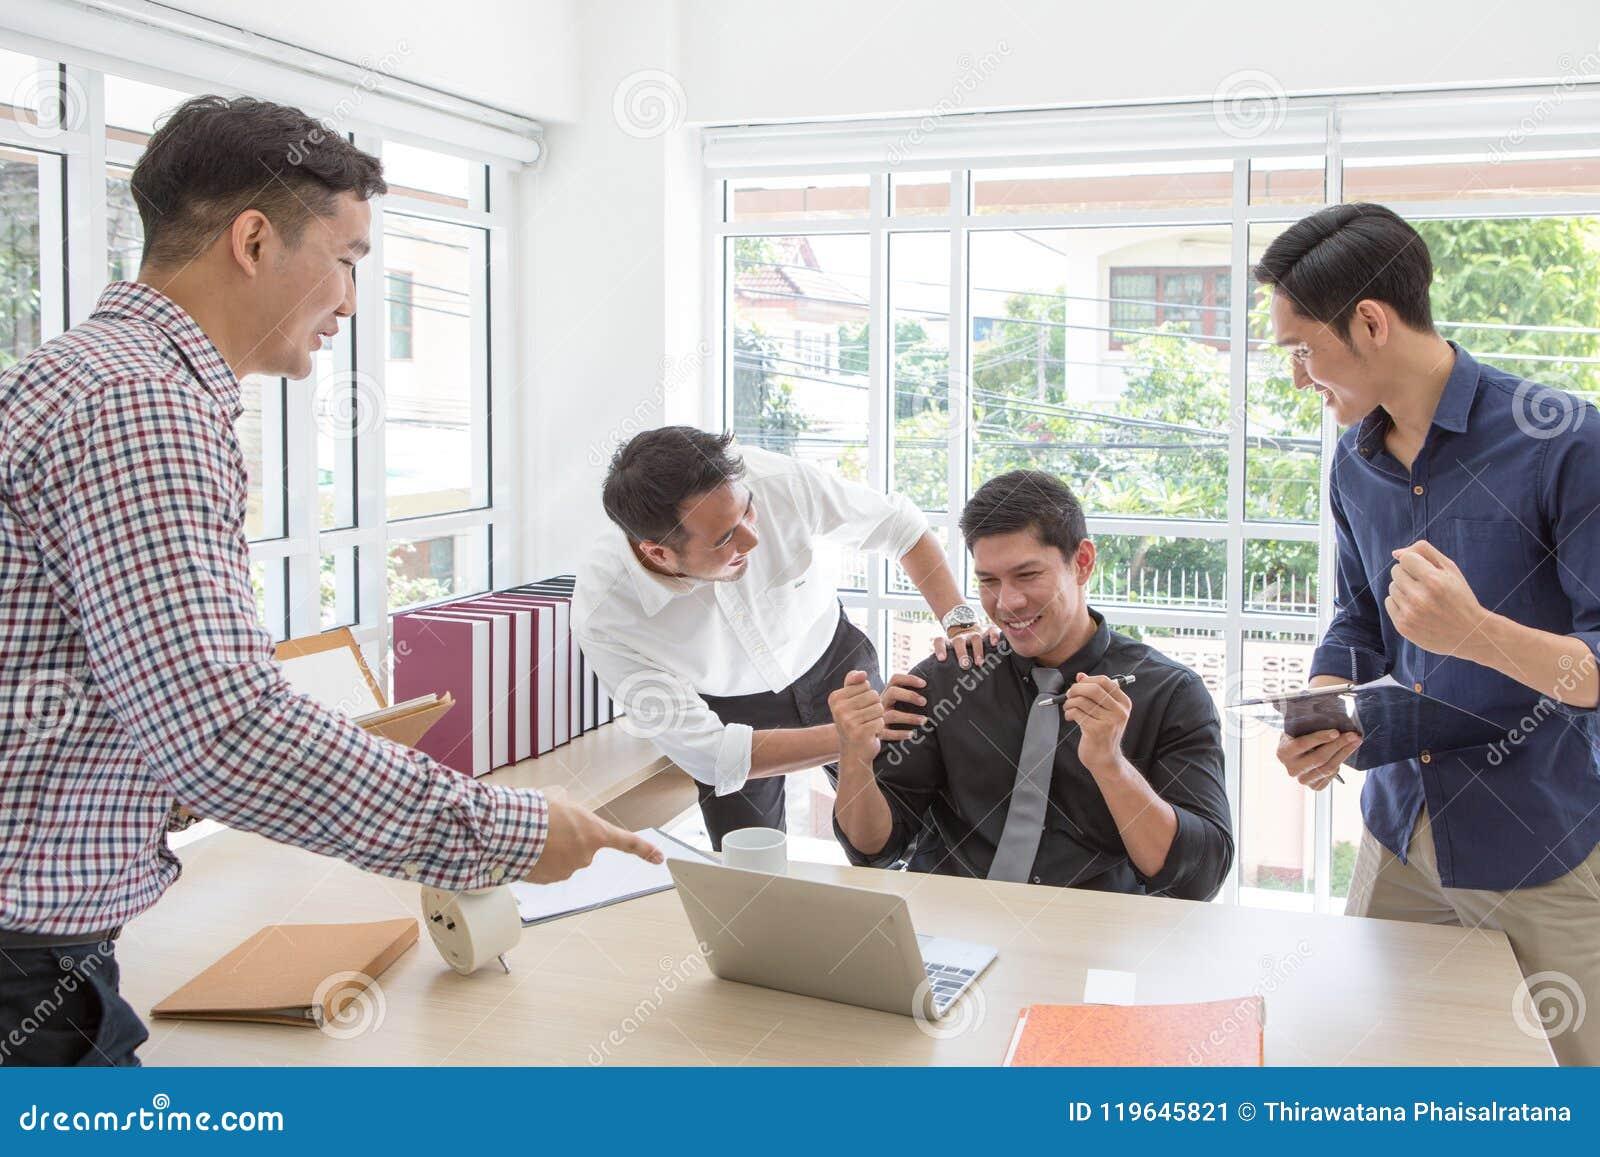 Business successCelebrate success. Business team celebrate a good job in the office.